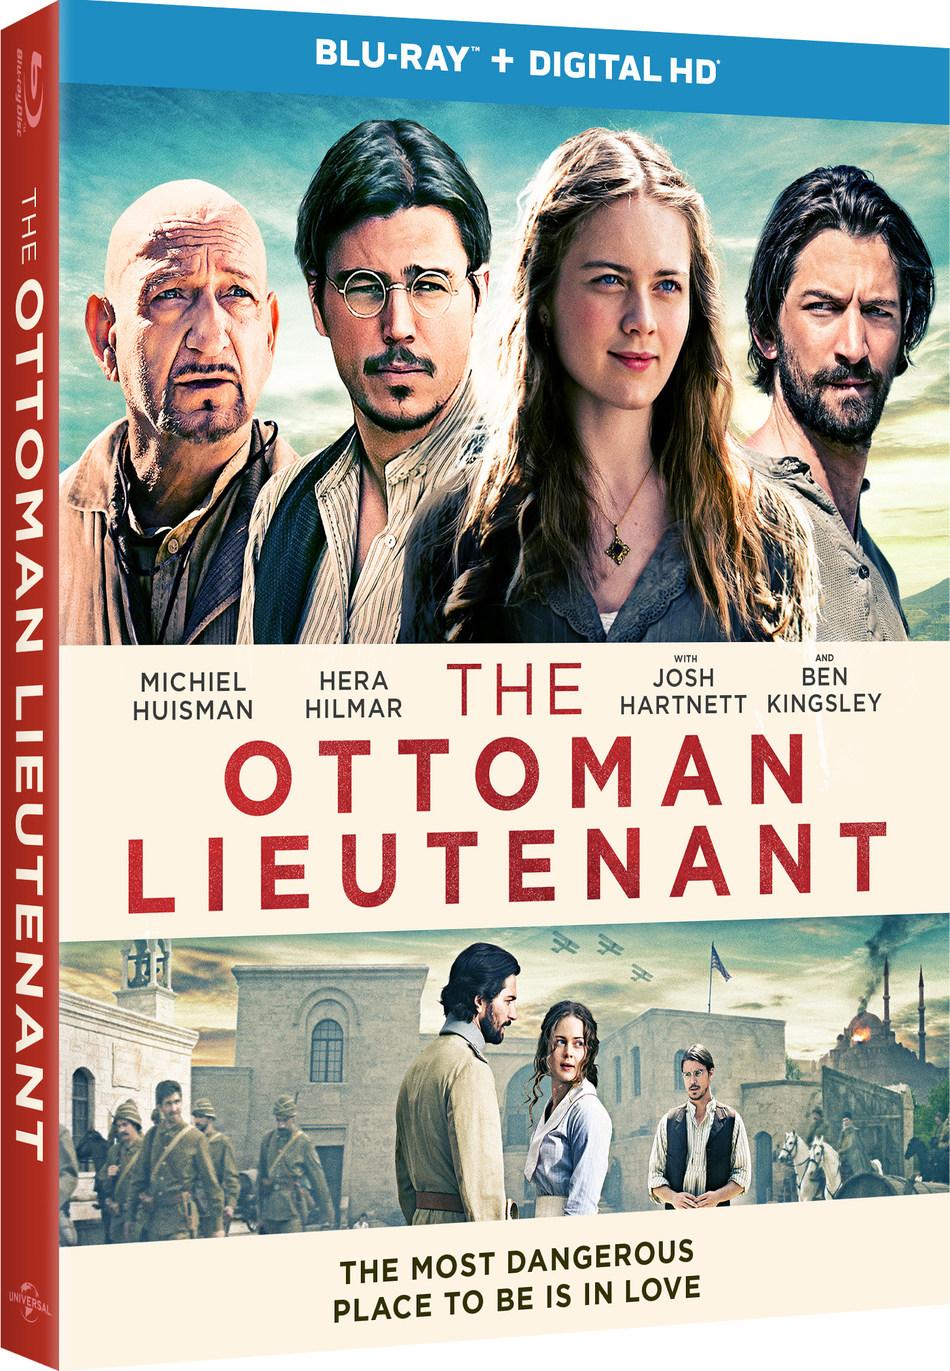 Universal Pictures Home Entertainment: The Ottoman Lieutenant